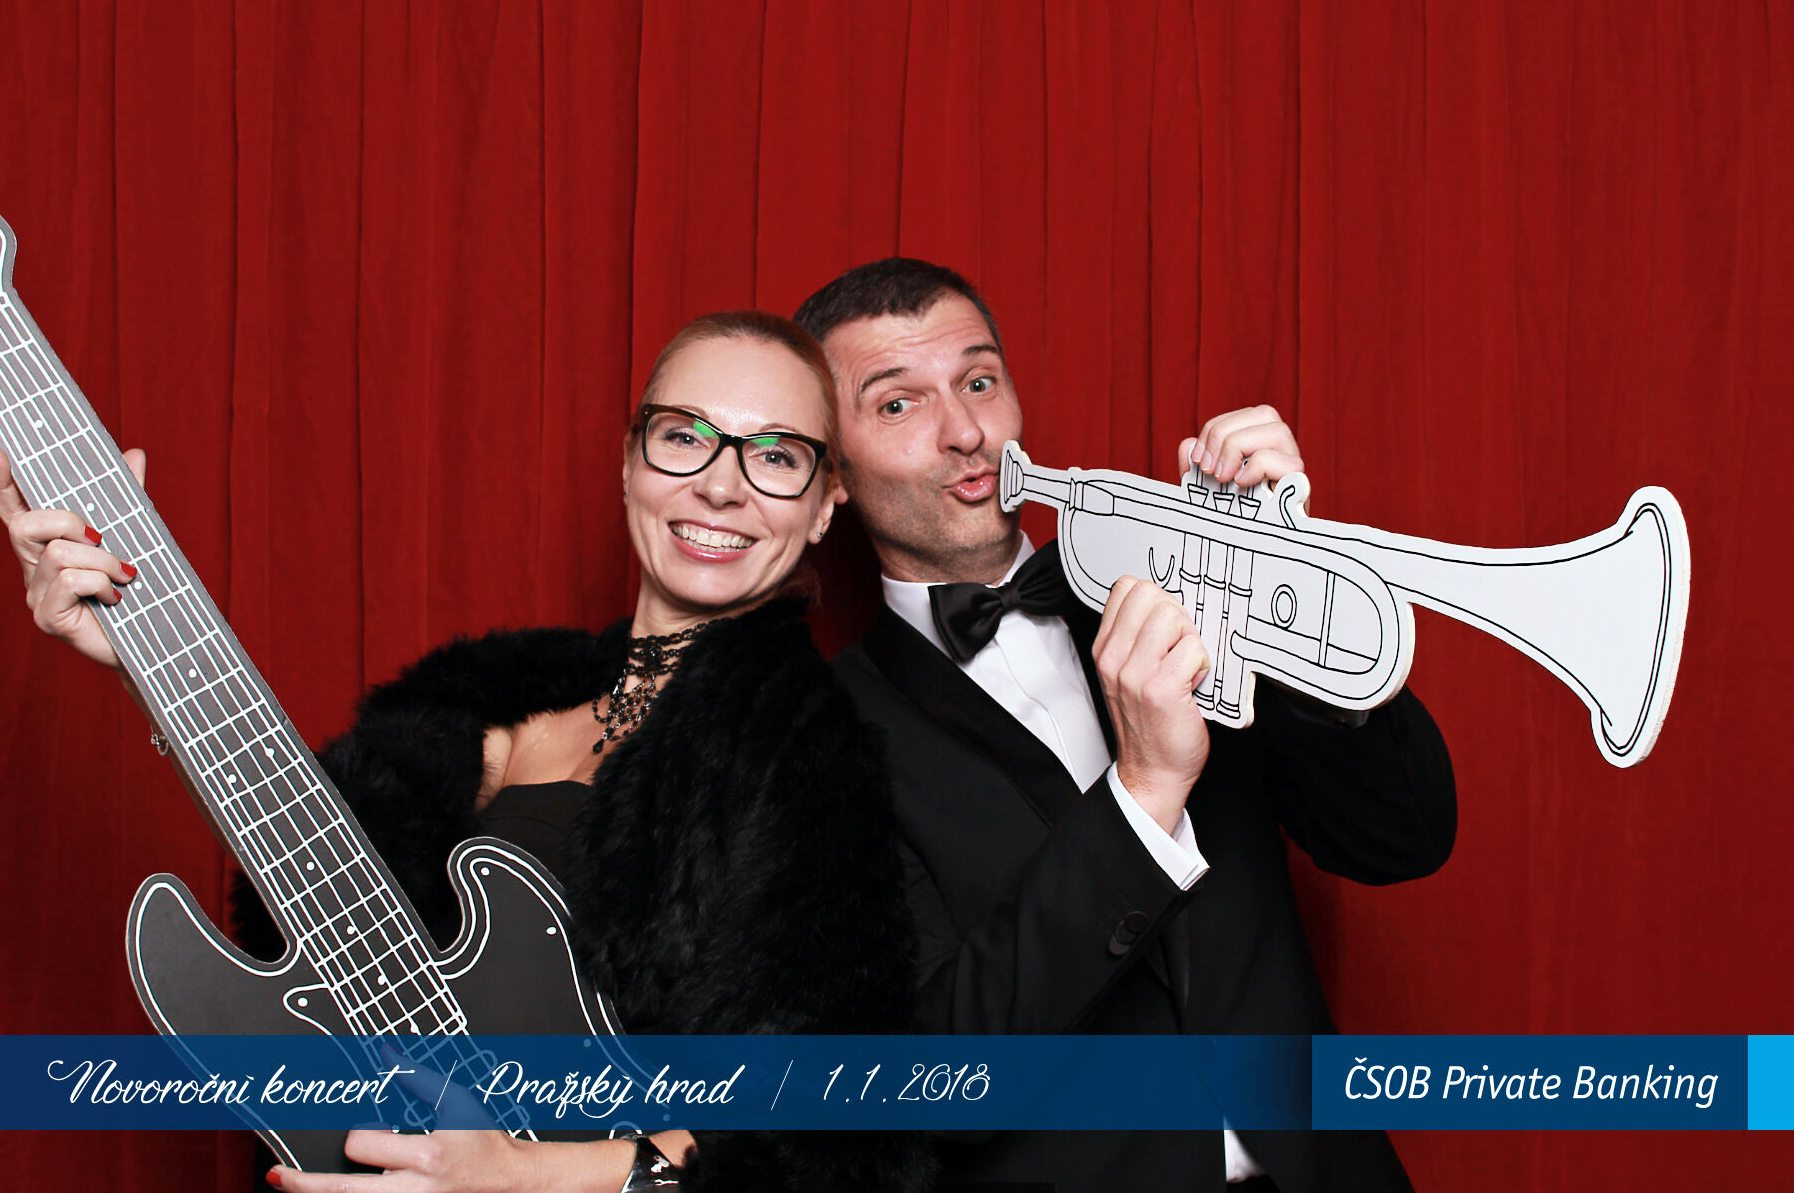 fotokoutek-csob-private-banking-novorocni-koncert-1-1-2018-377251